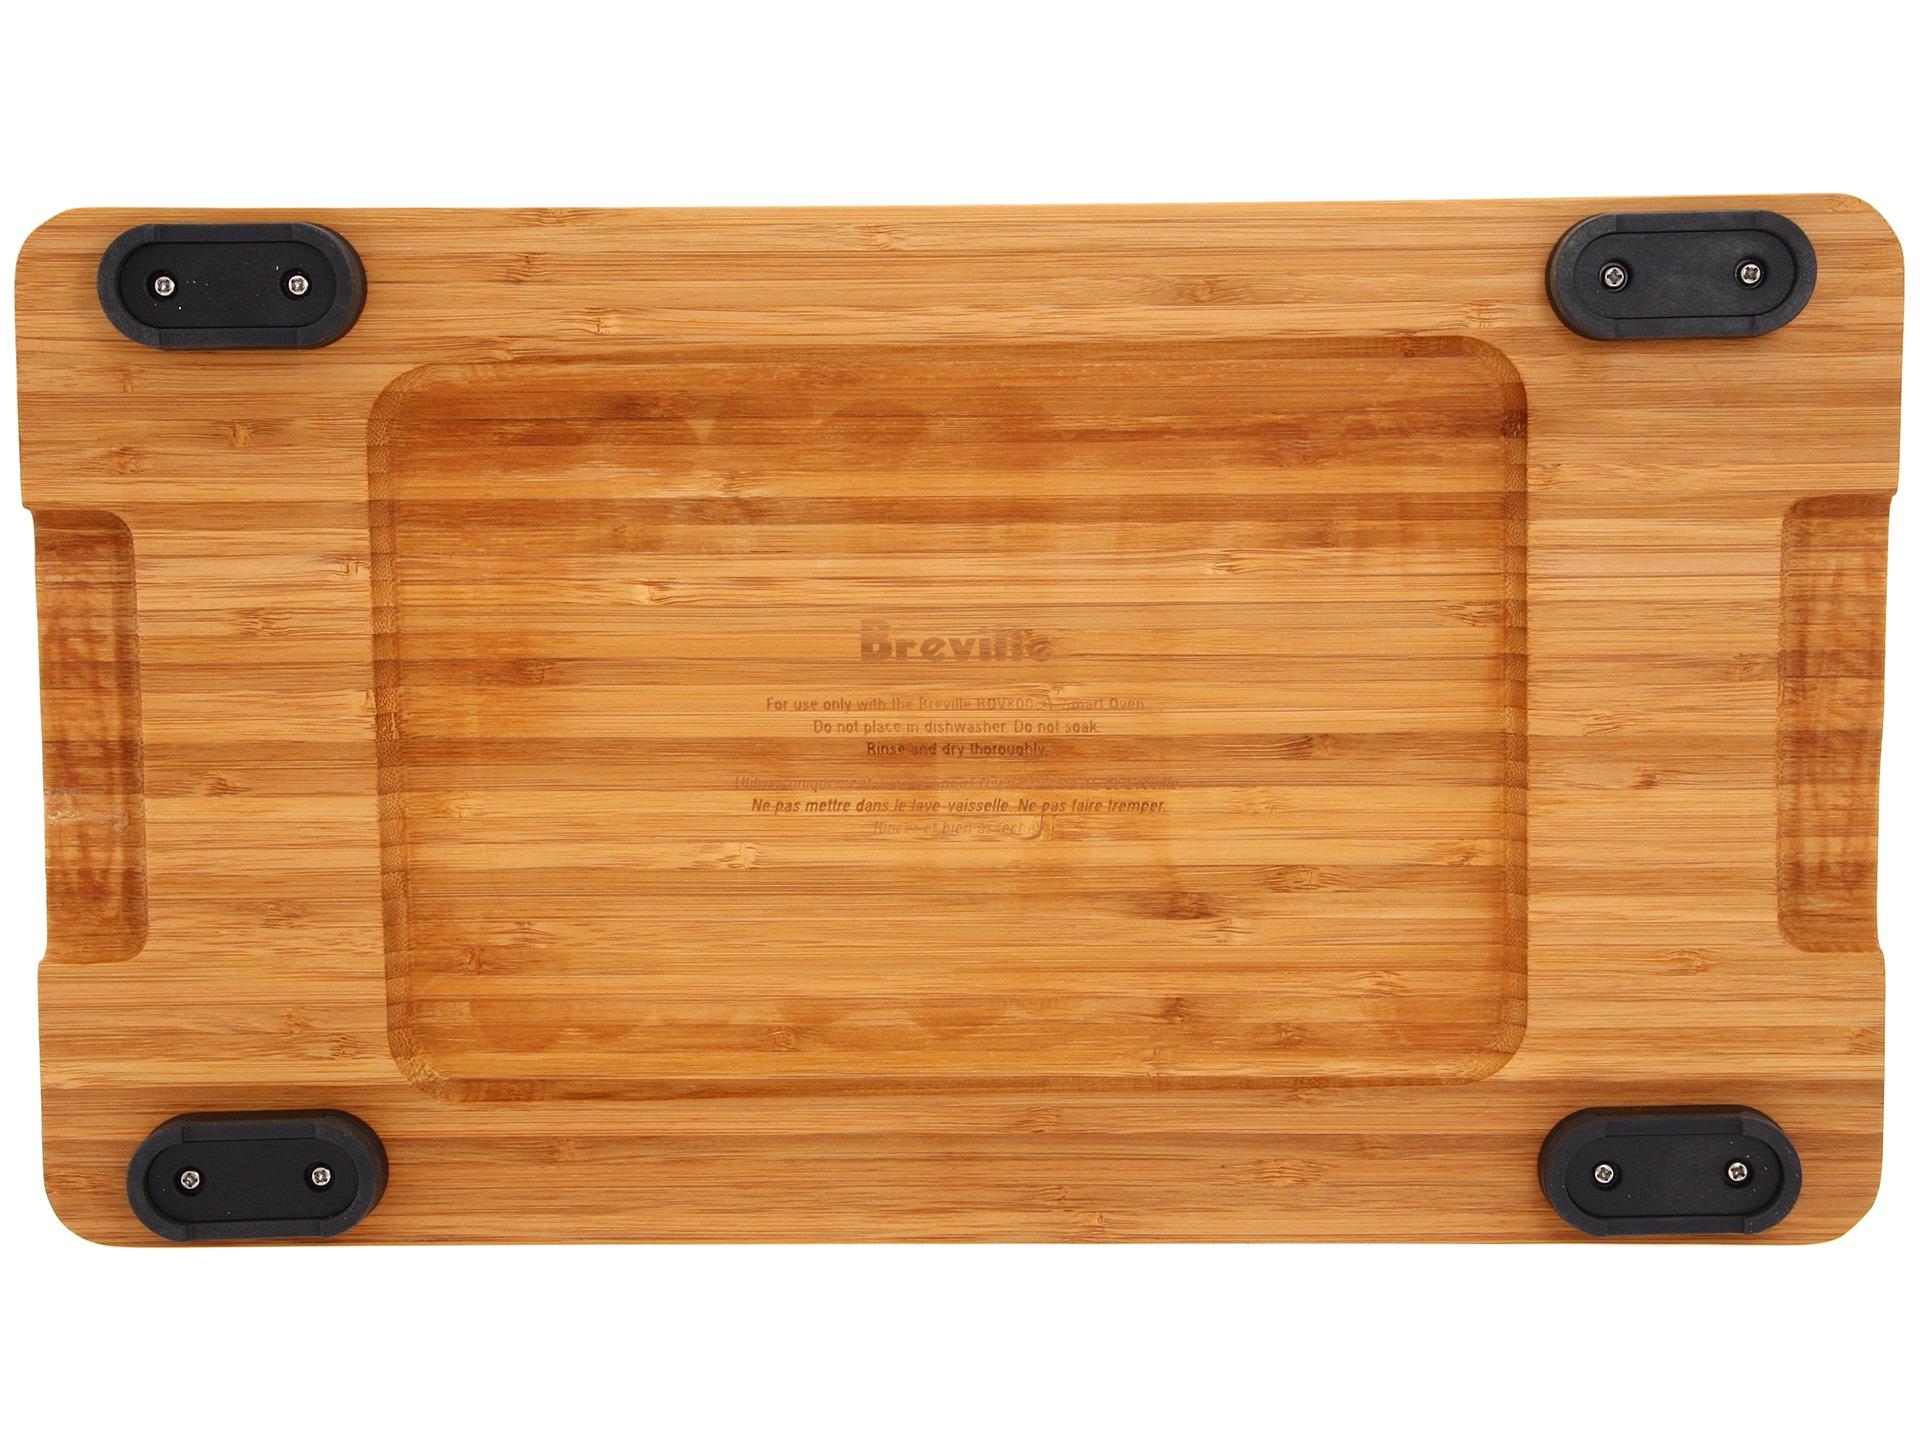 Breville Bov800cb Bamboo Cutting Board For Smart Oven